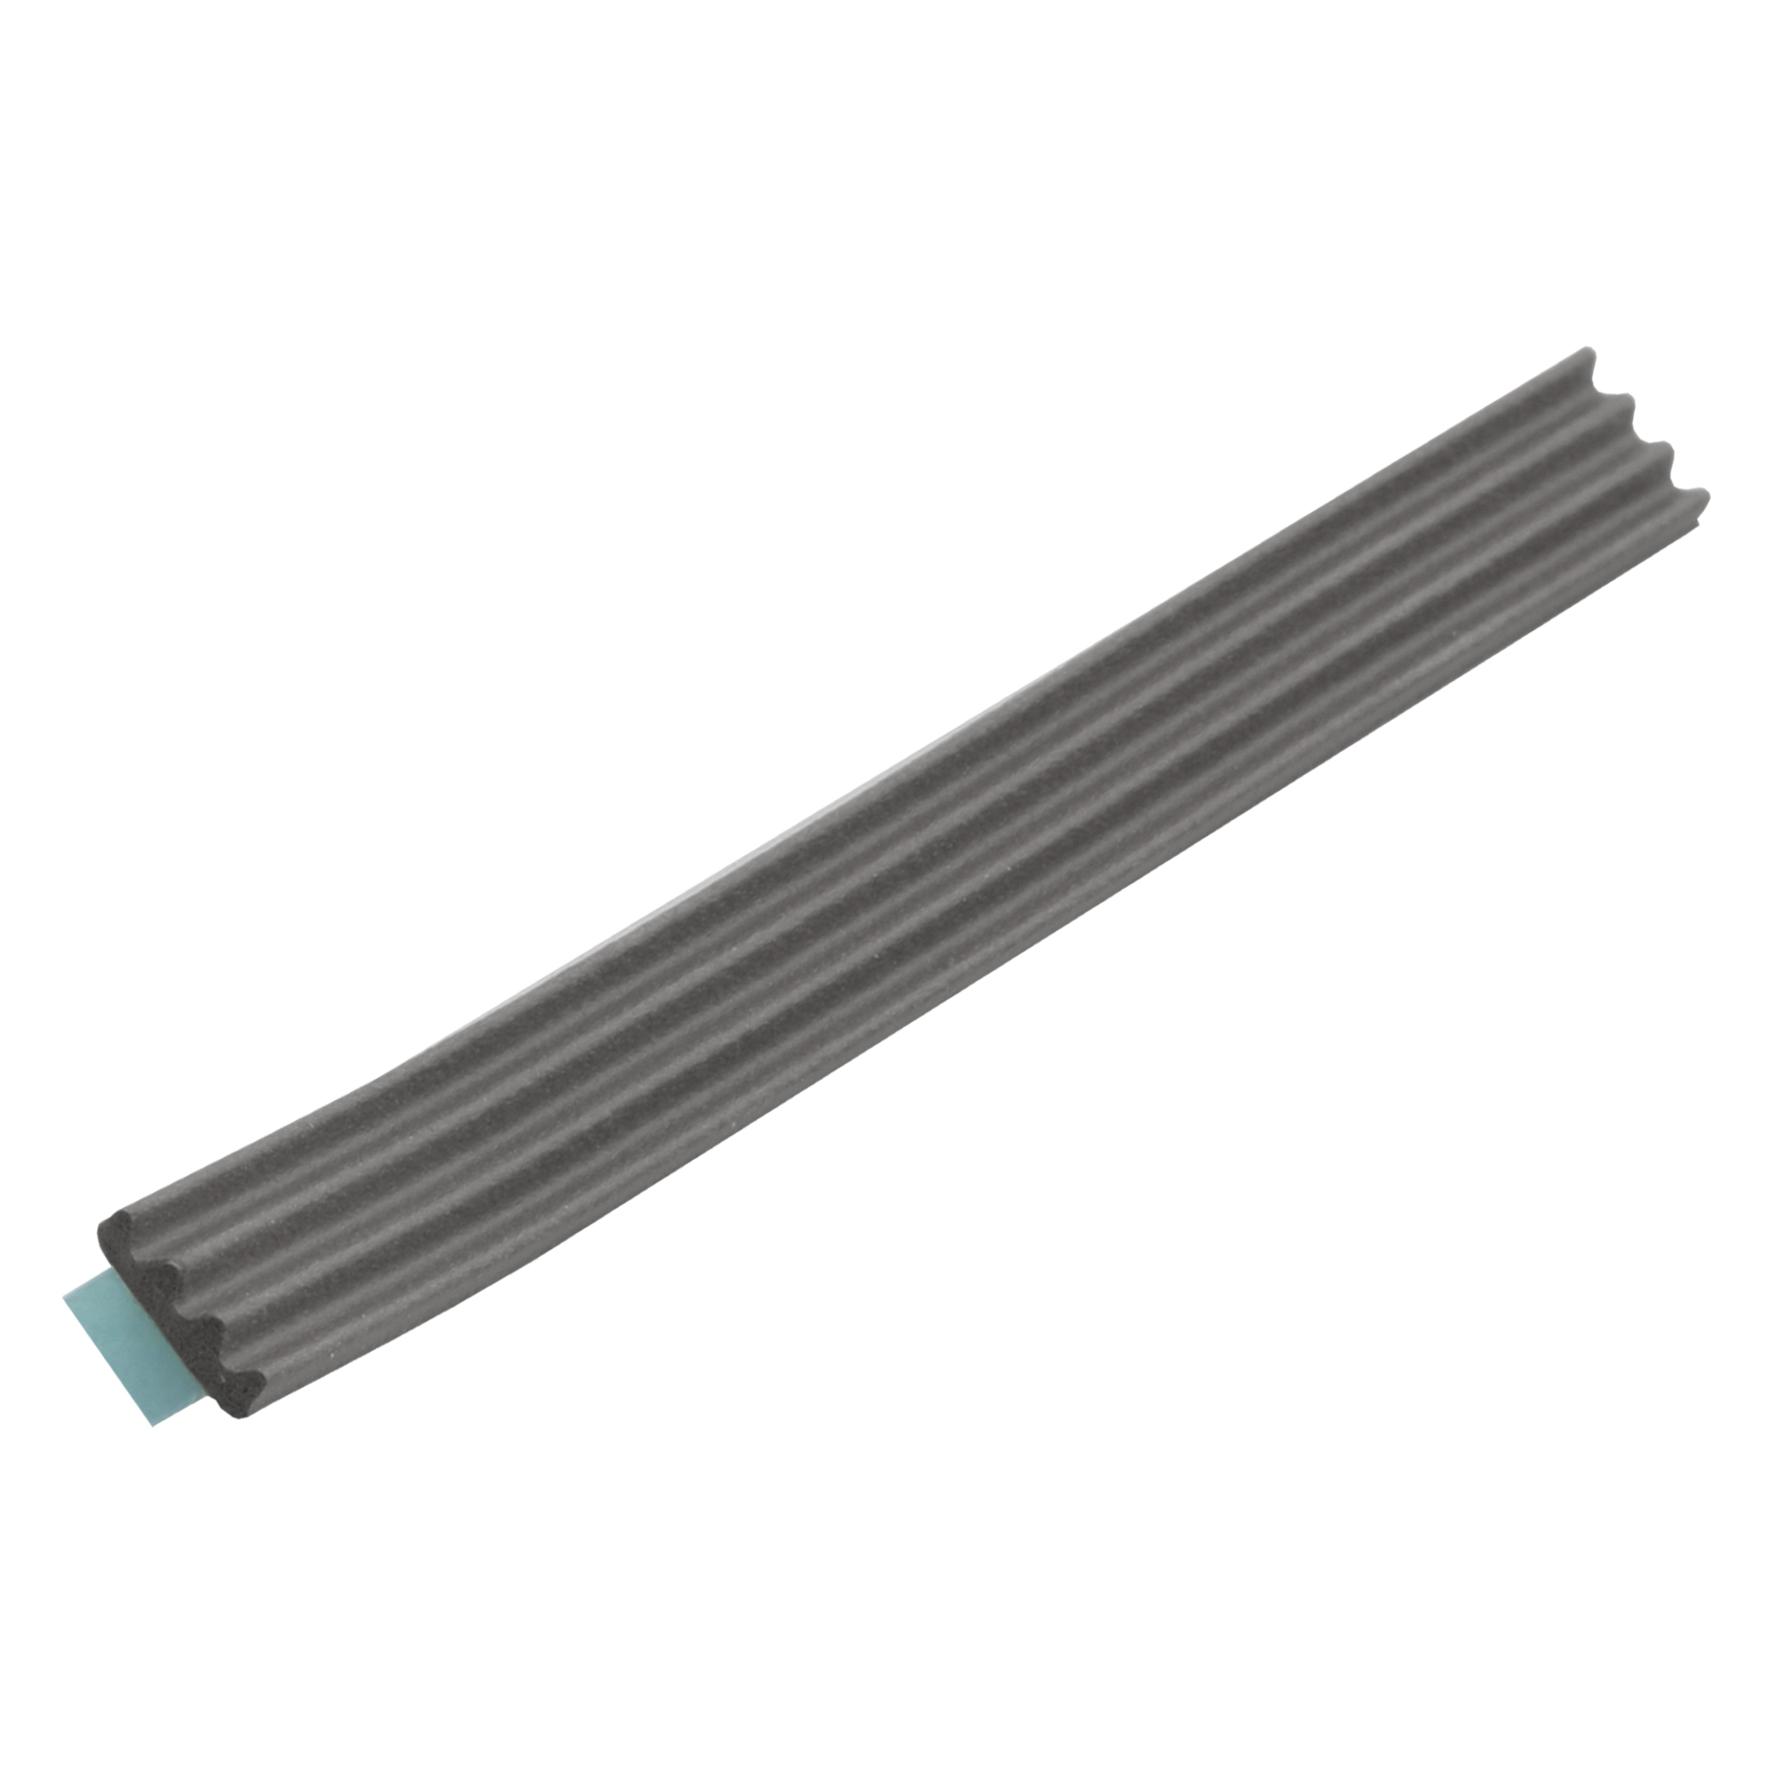 Ellen - Tochtband k-profiel - zwart - 9x3 - 7.5m